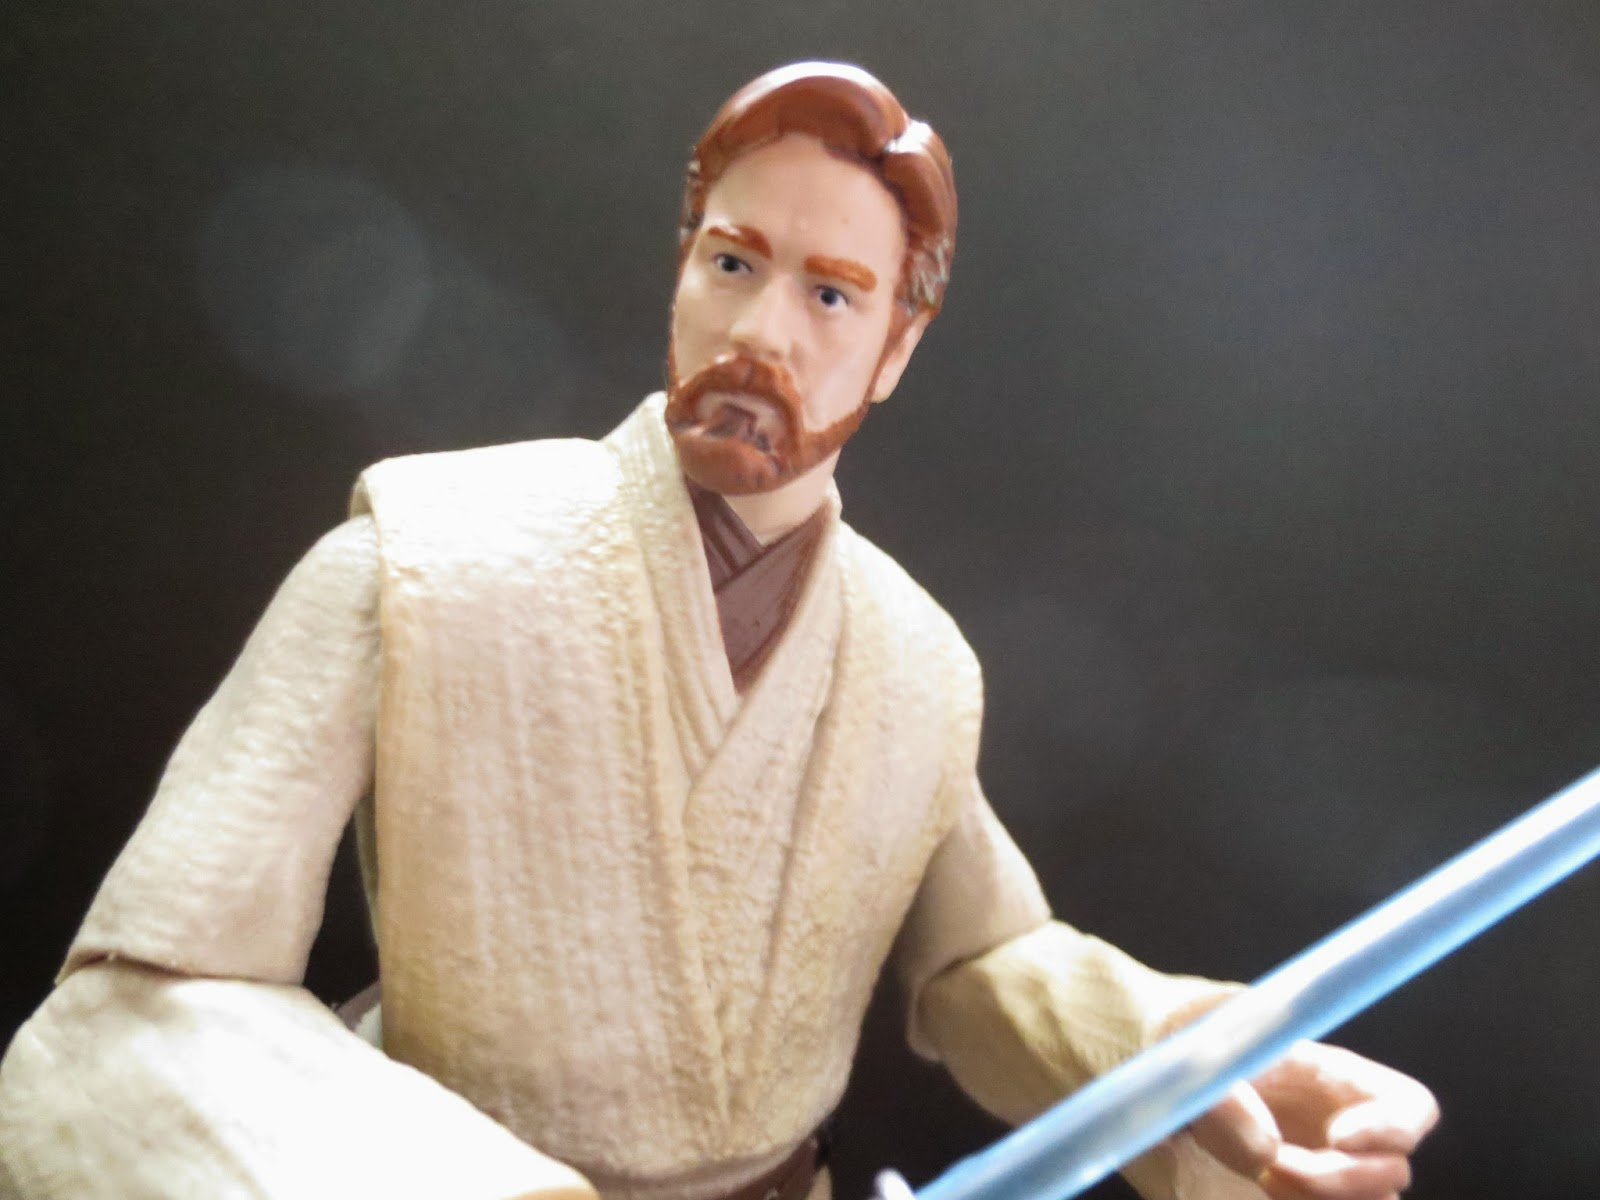 Obi Wan Kenobi Actor Action Figure Barbecue...